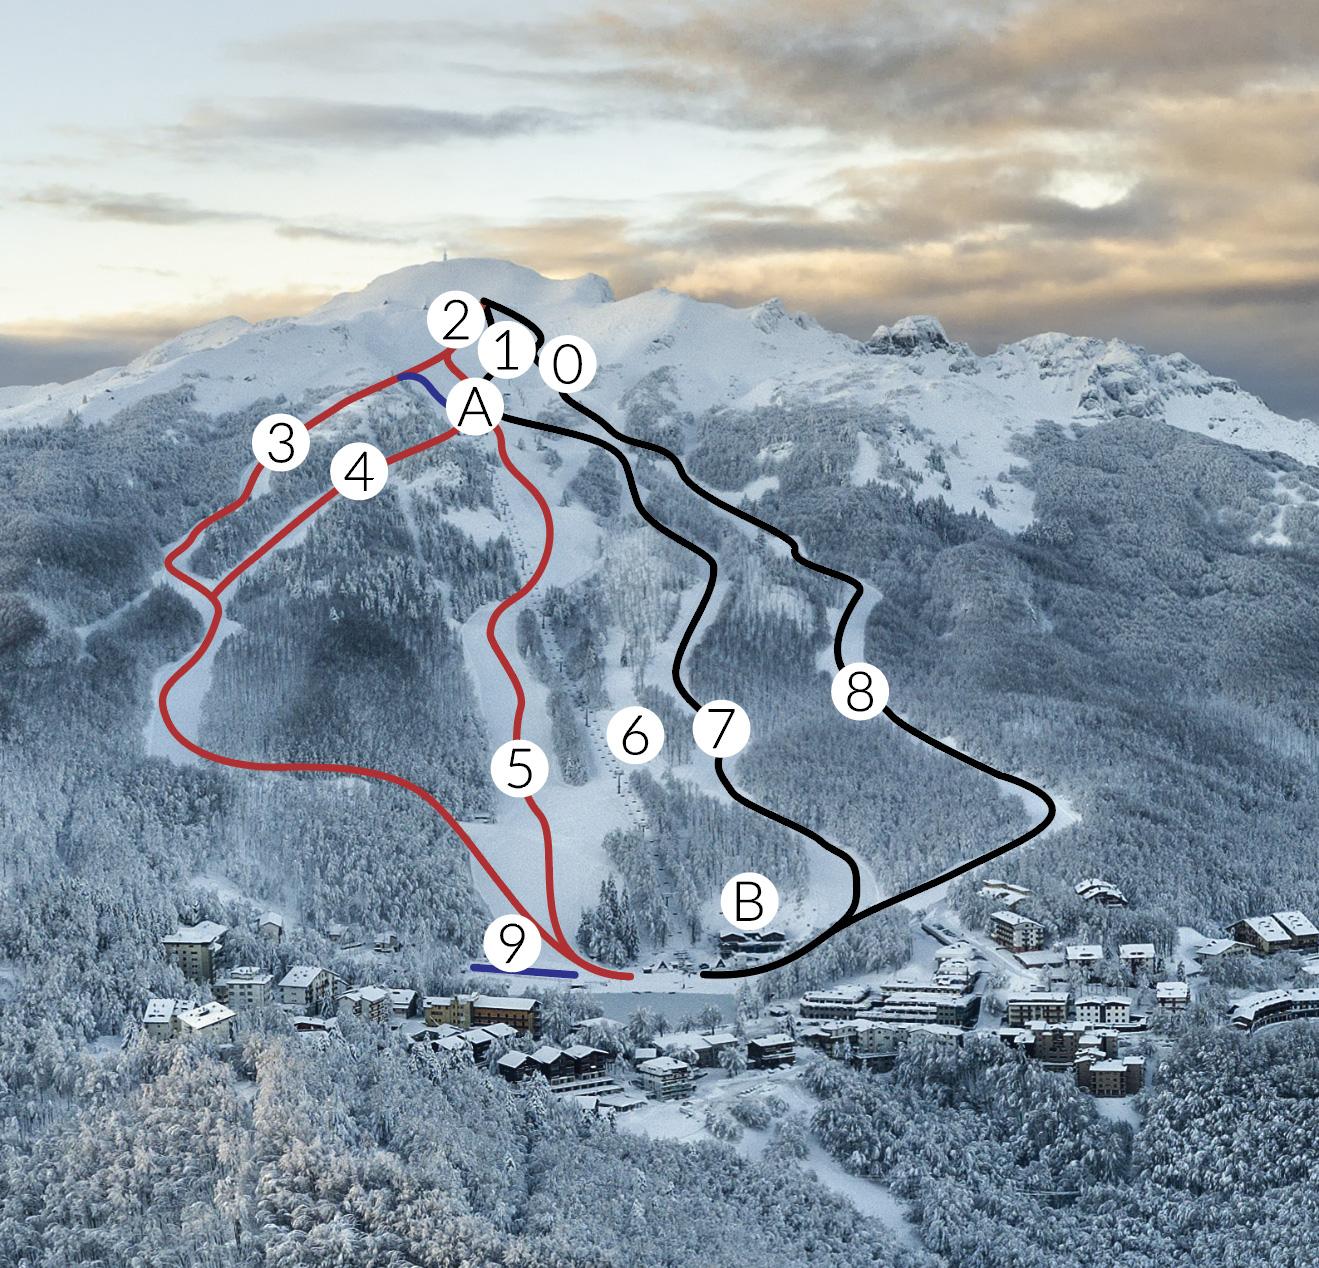 Where to Ski in Emilia-Romagna